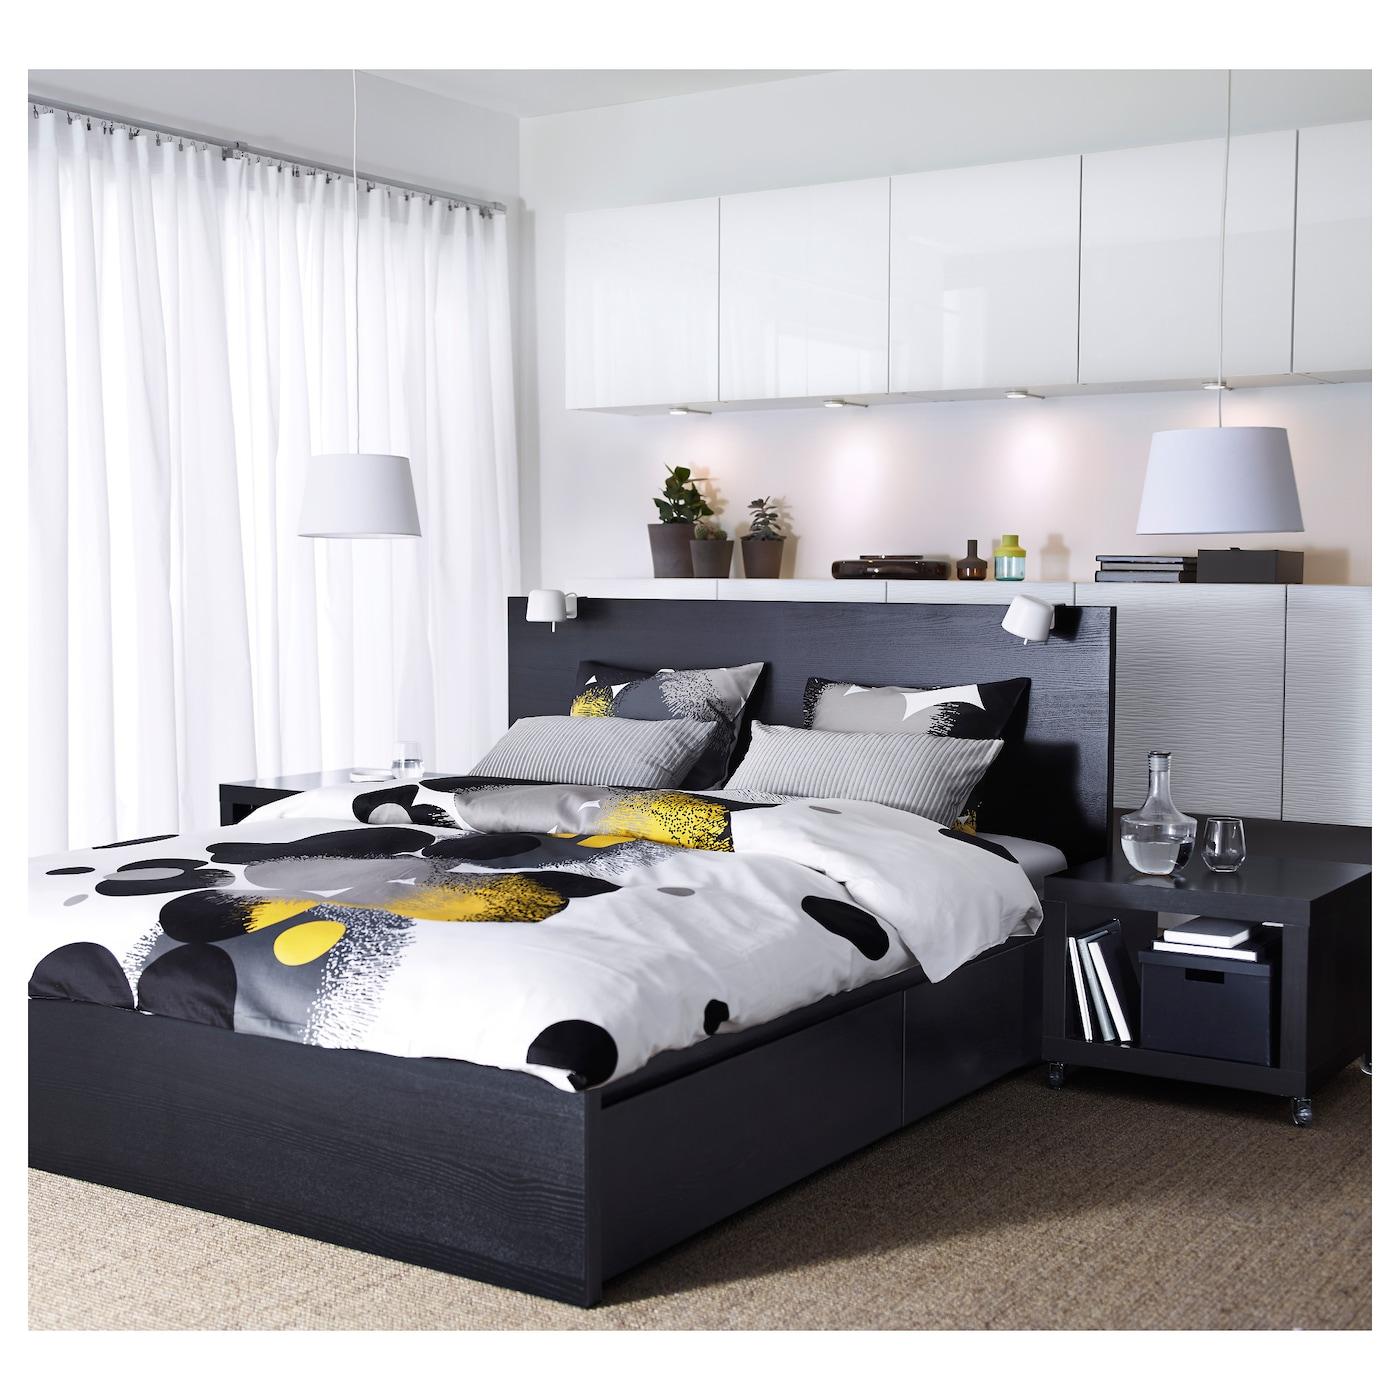 Malm estruc cama alta 2 cj negro marr n 140 x 200 cm ikea - Cama malm ikea ...